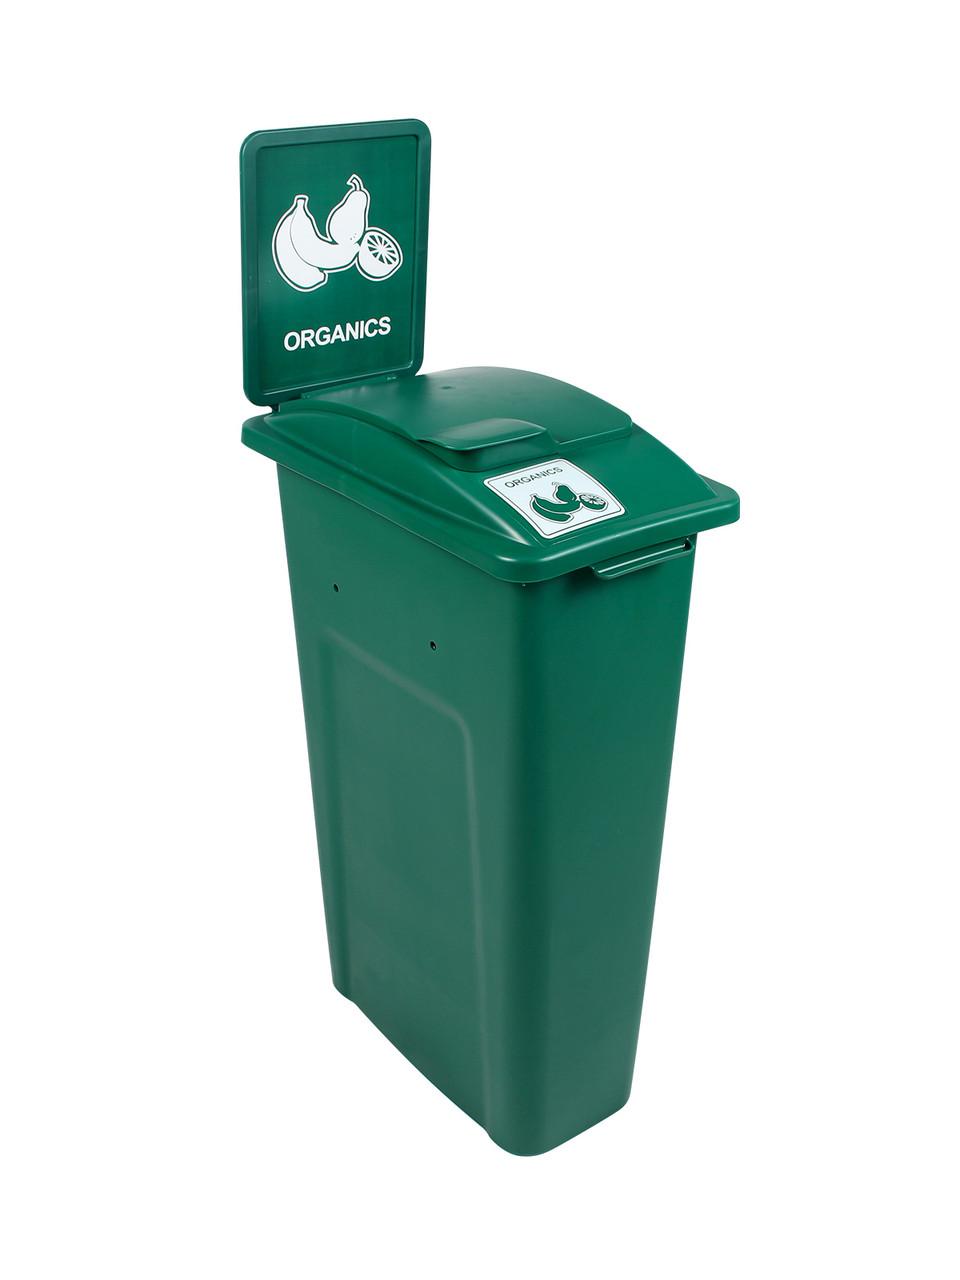 23 Gallon Skinny Simple Sort Compost Bin with Sign (Organics, Lift Top)